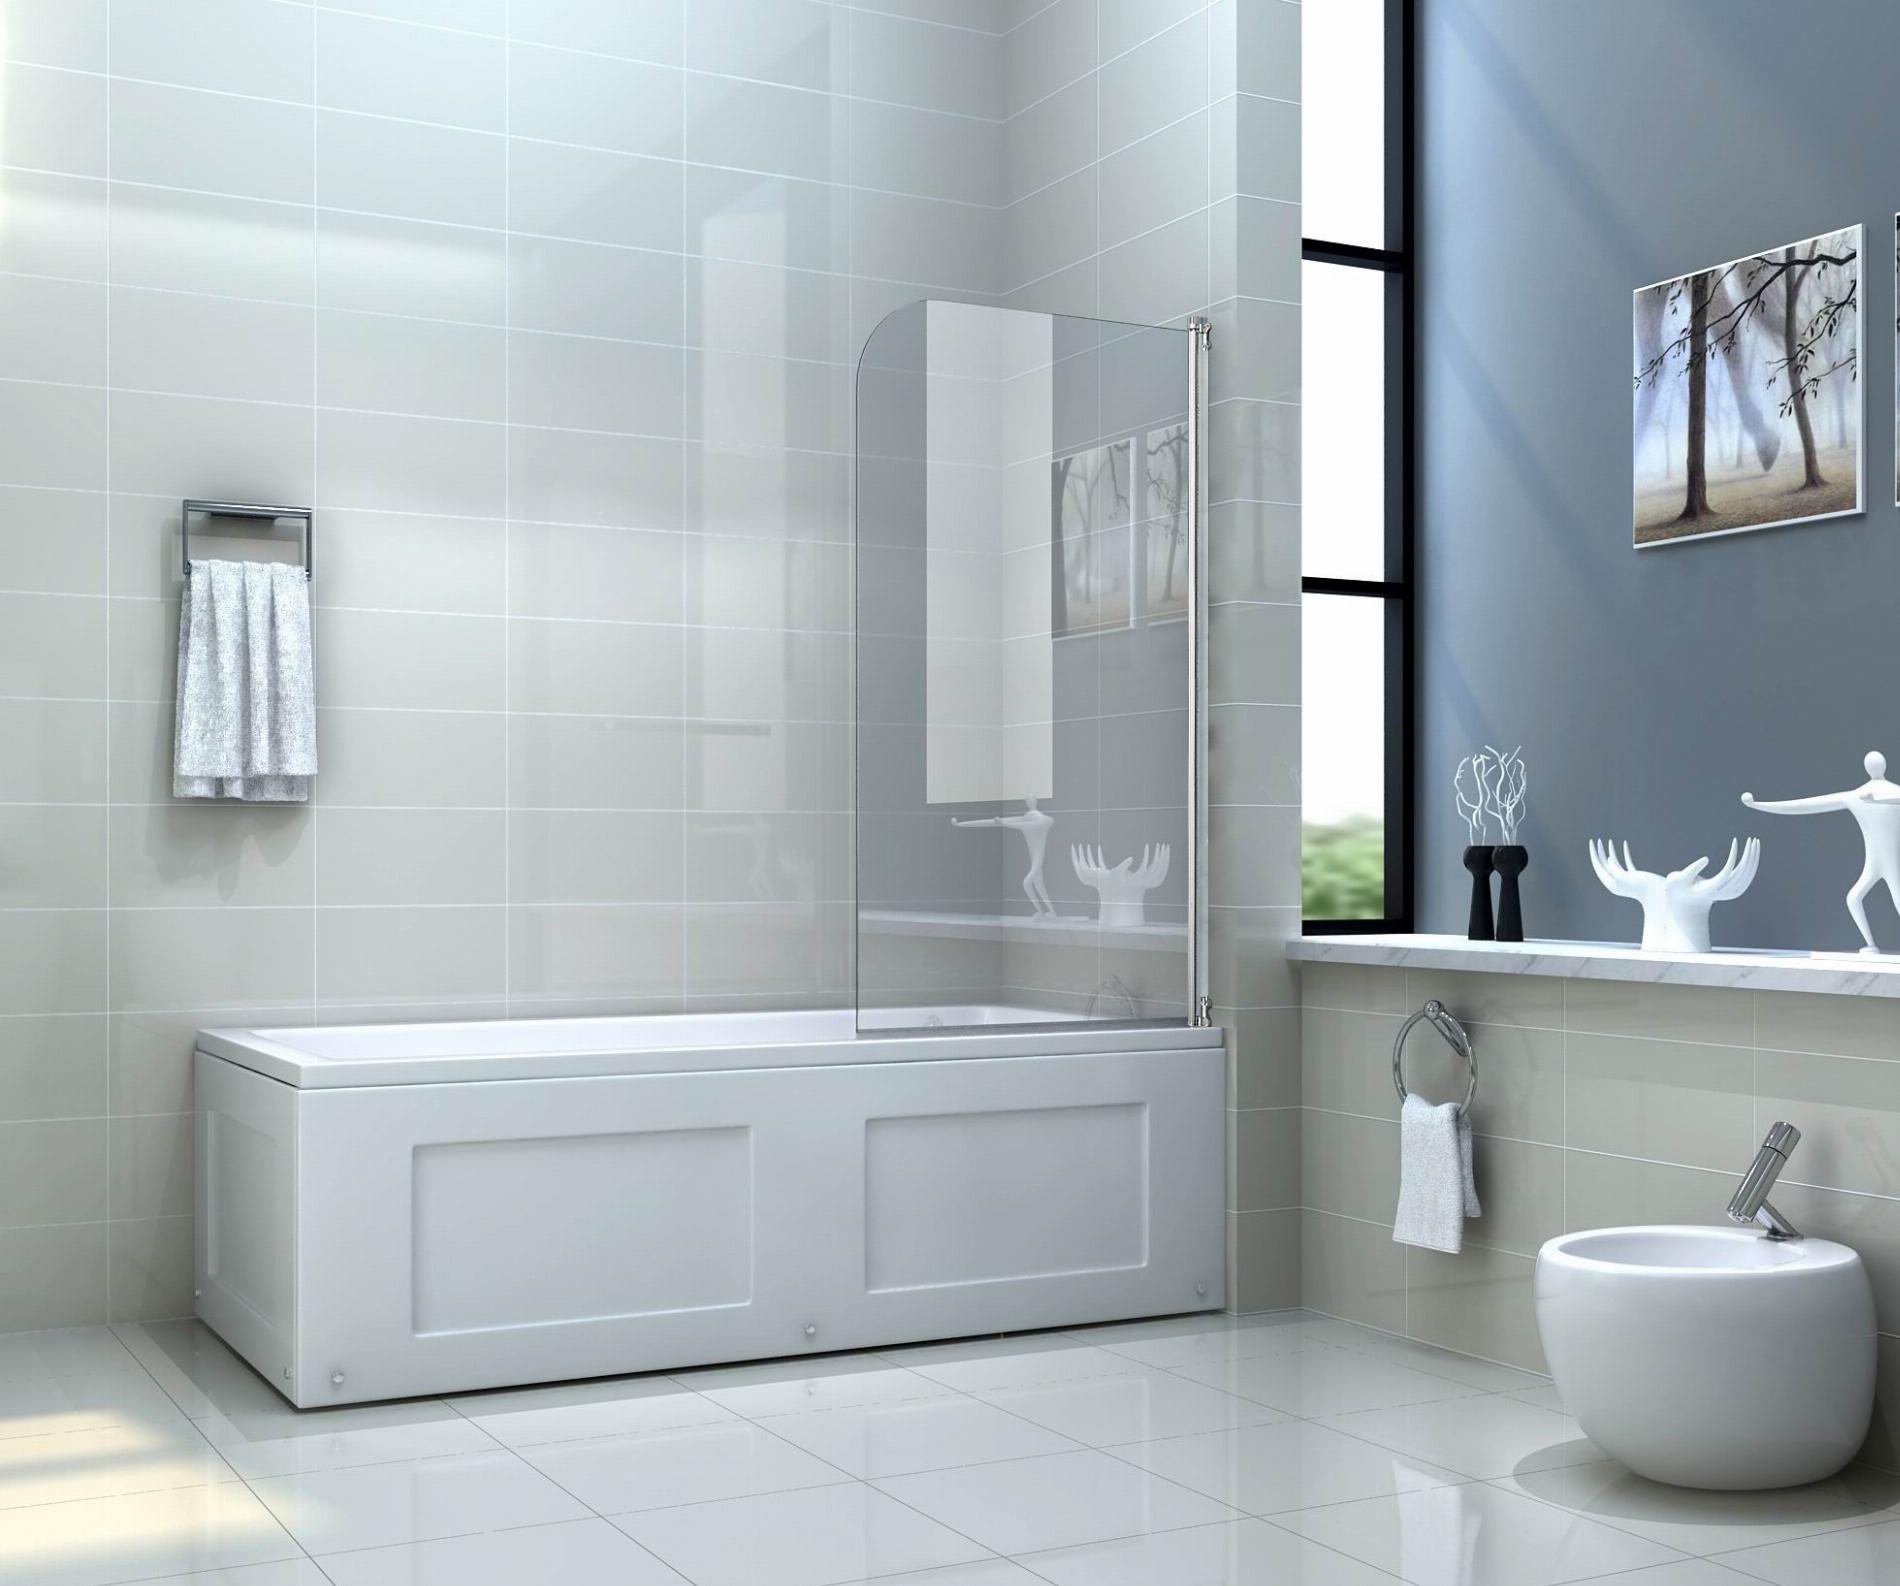 Duschtrennwand R80 (Badewanne)